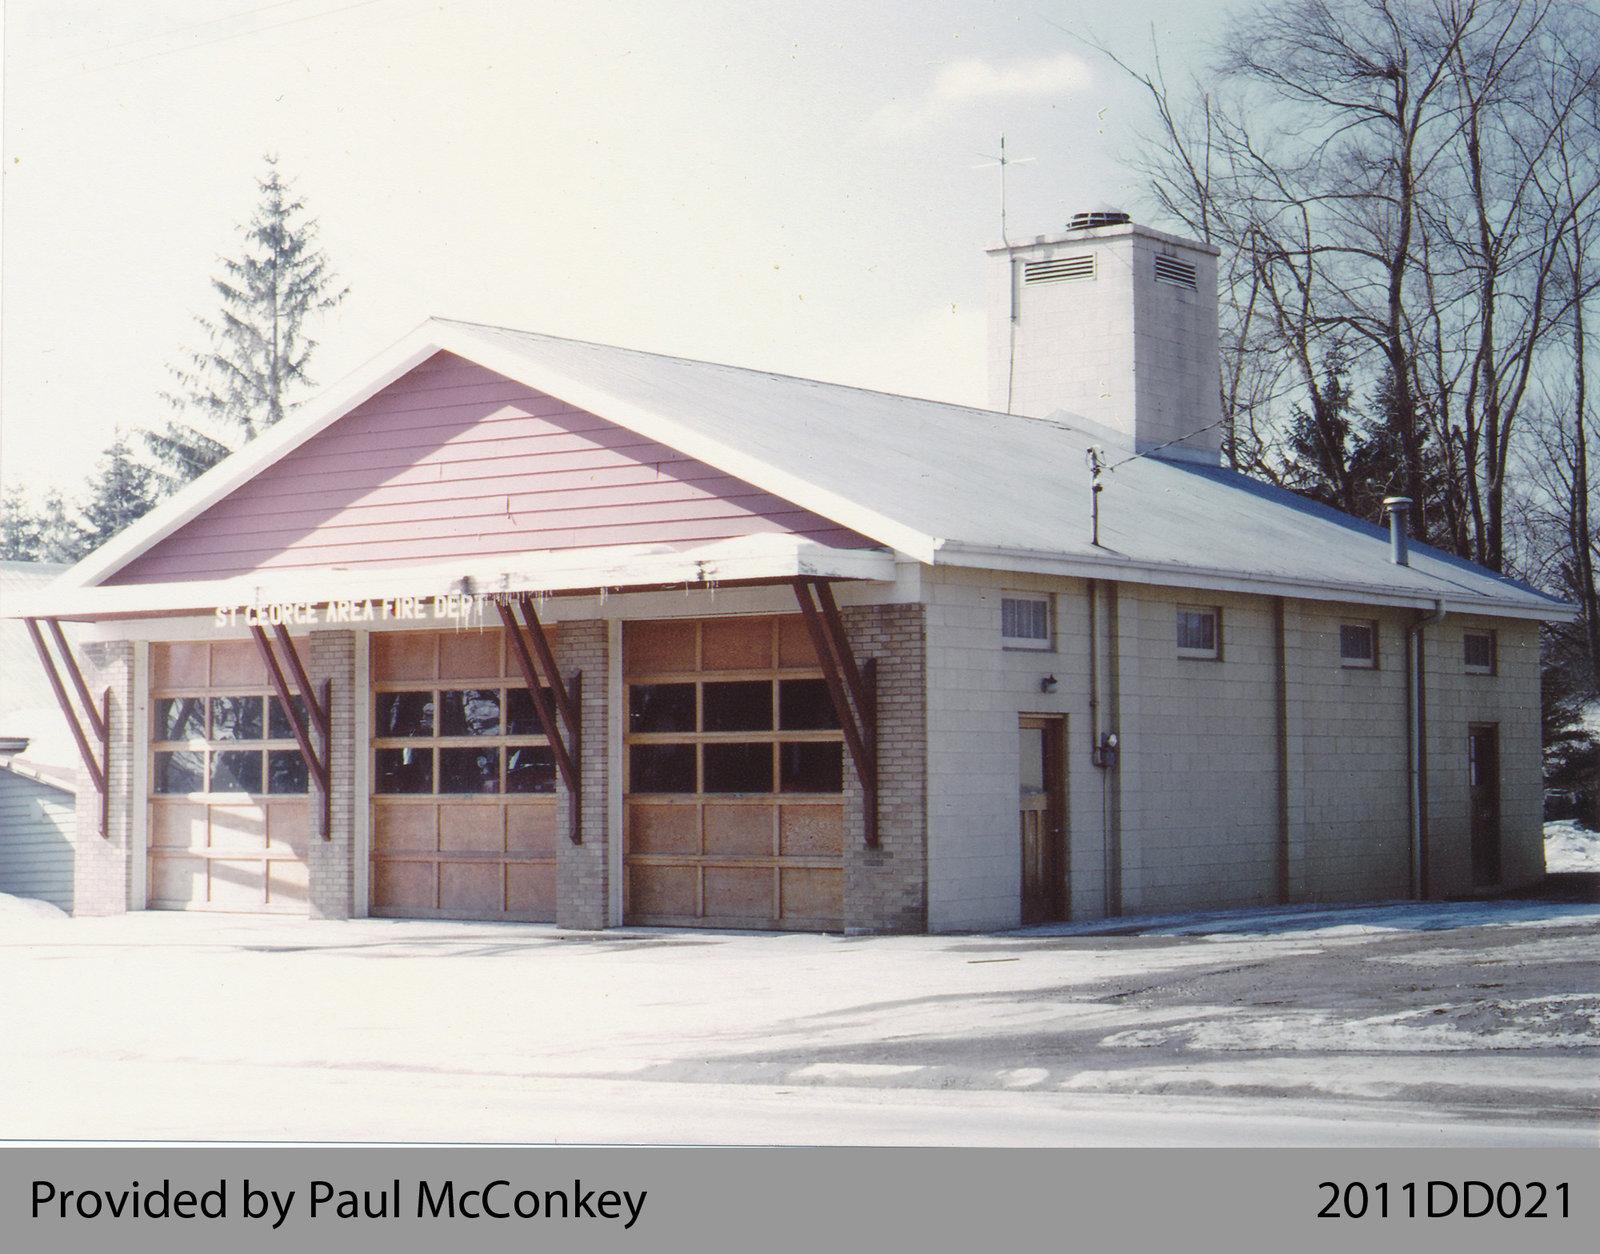 St. George Fire Hall